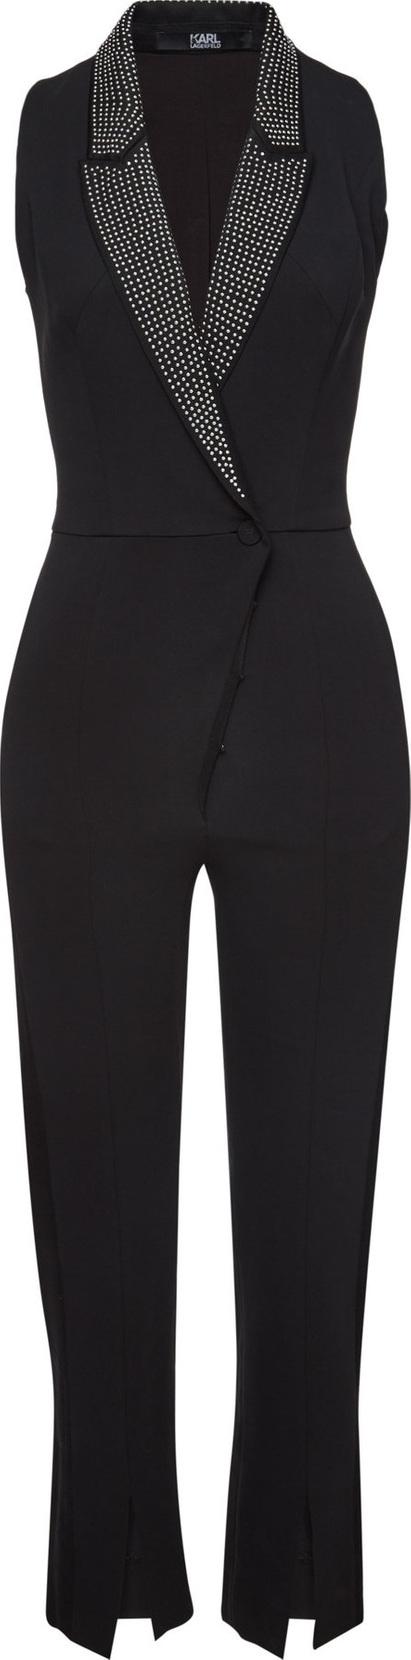 Karl Lagerfeld Crepe Jumpsuit with Embellished Lapels